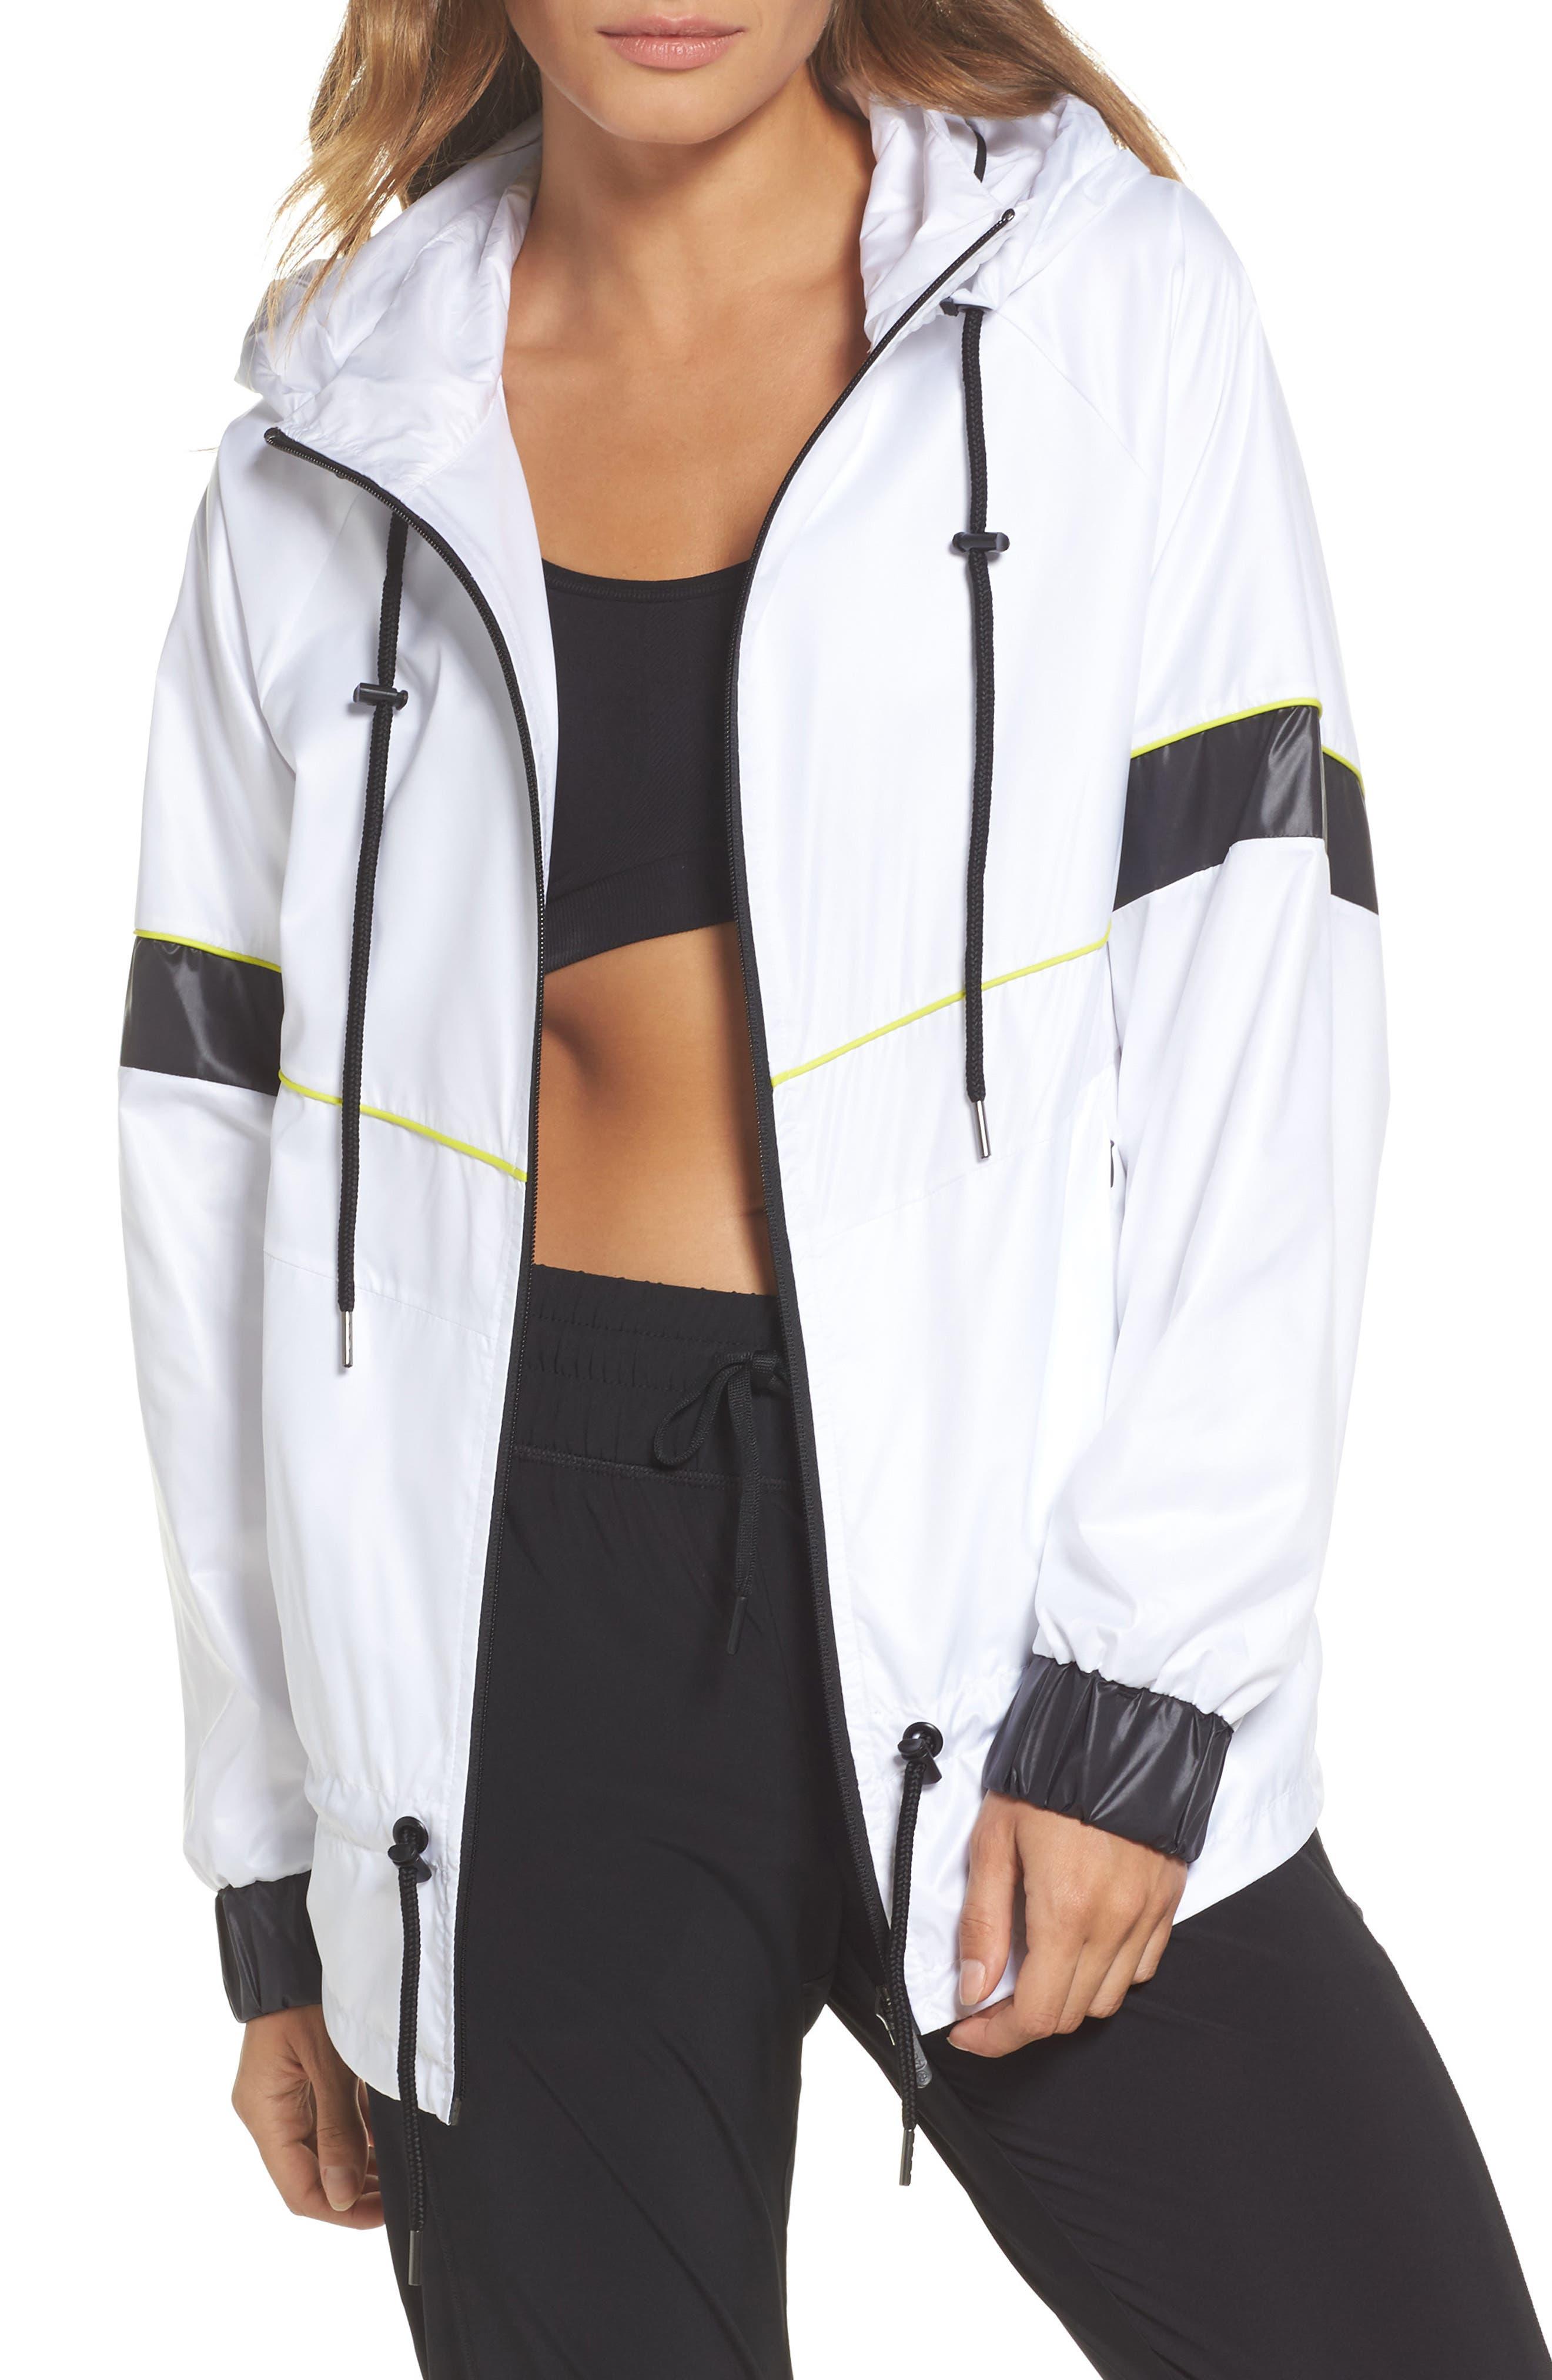 Shadowboxer Jacket,                         Main,                         color, White